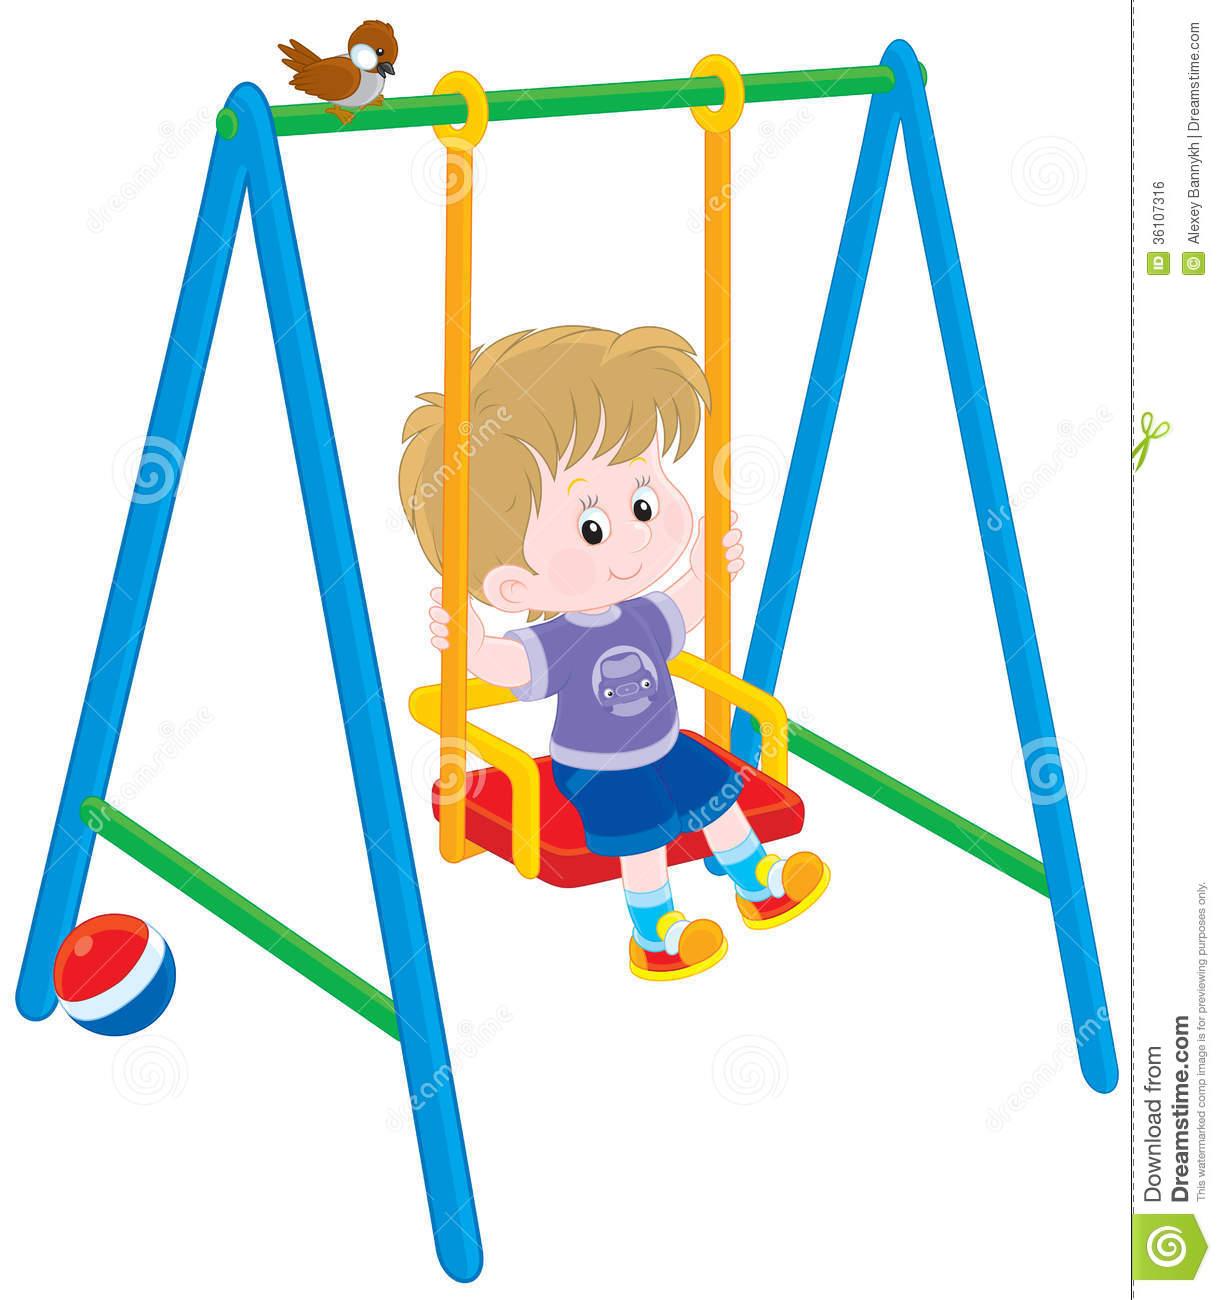 swing clipart-swing clipart-16